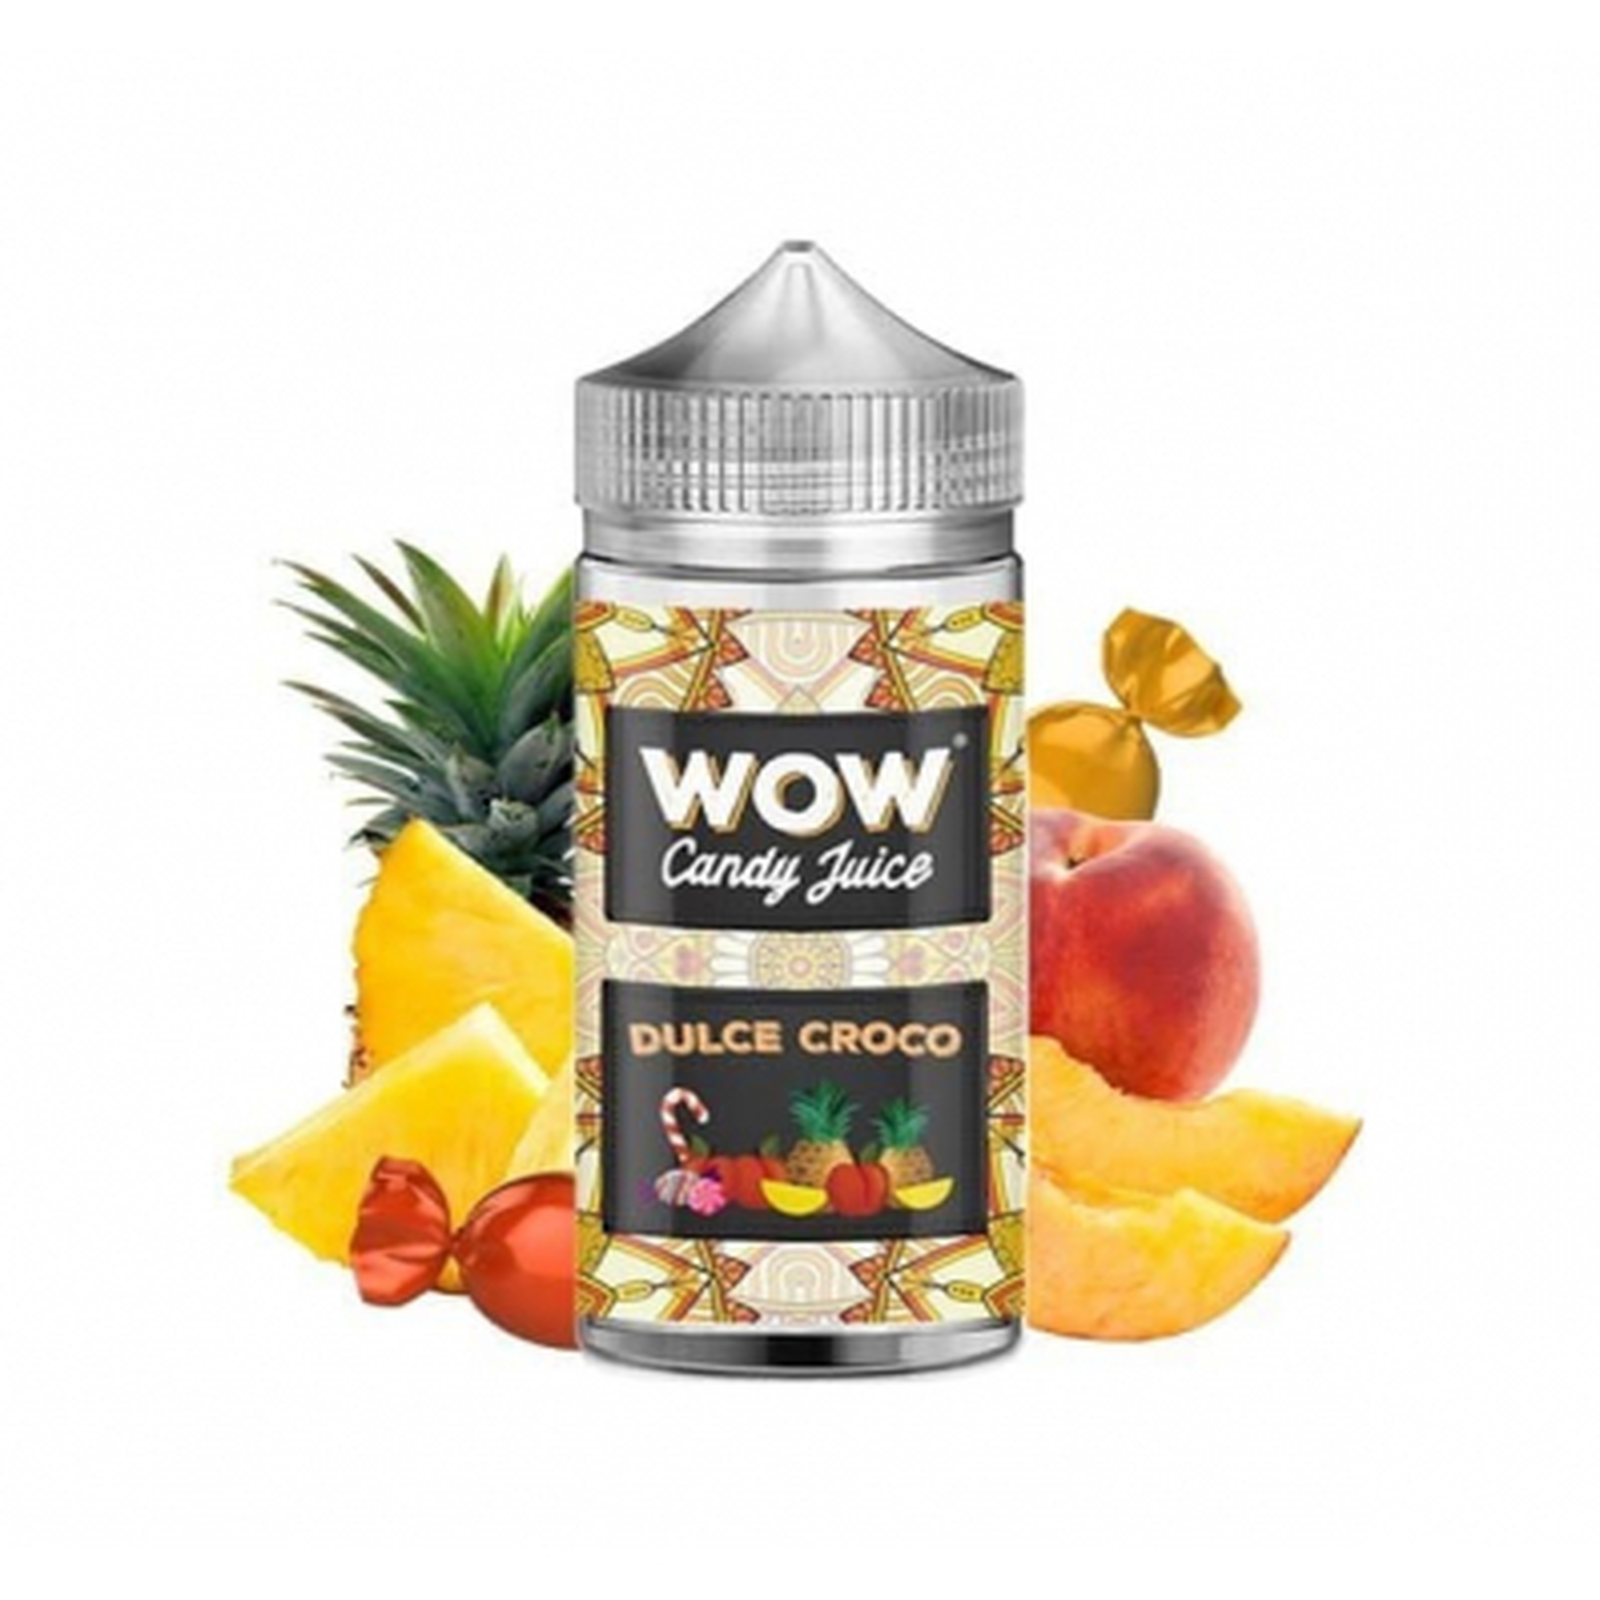 Dulce Croco 100ml - WOW Candy Juice